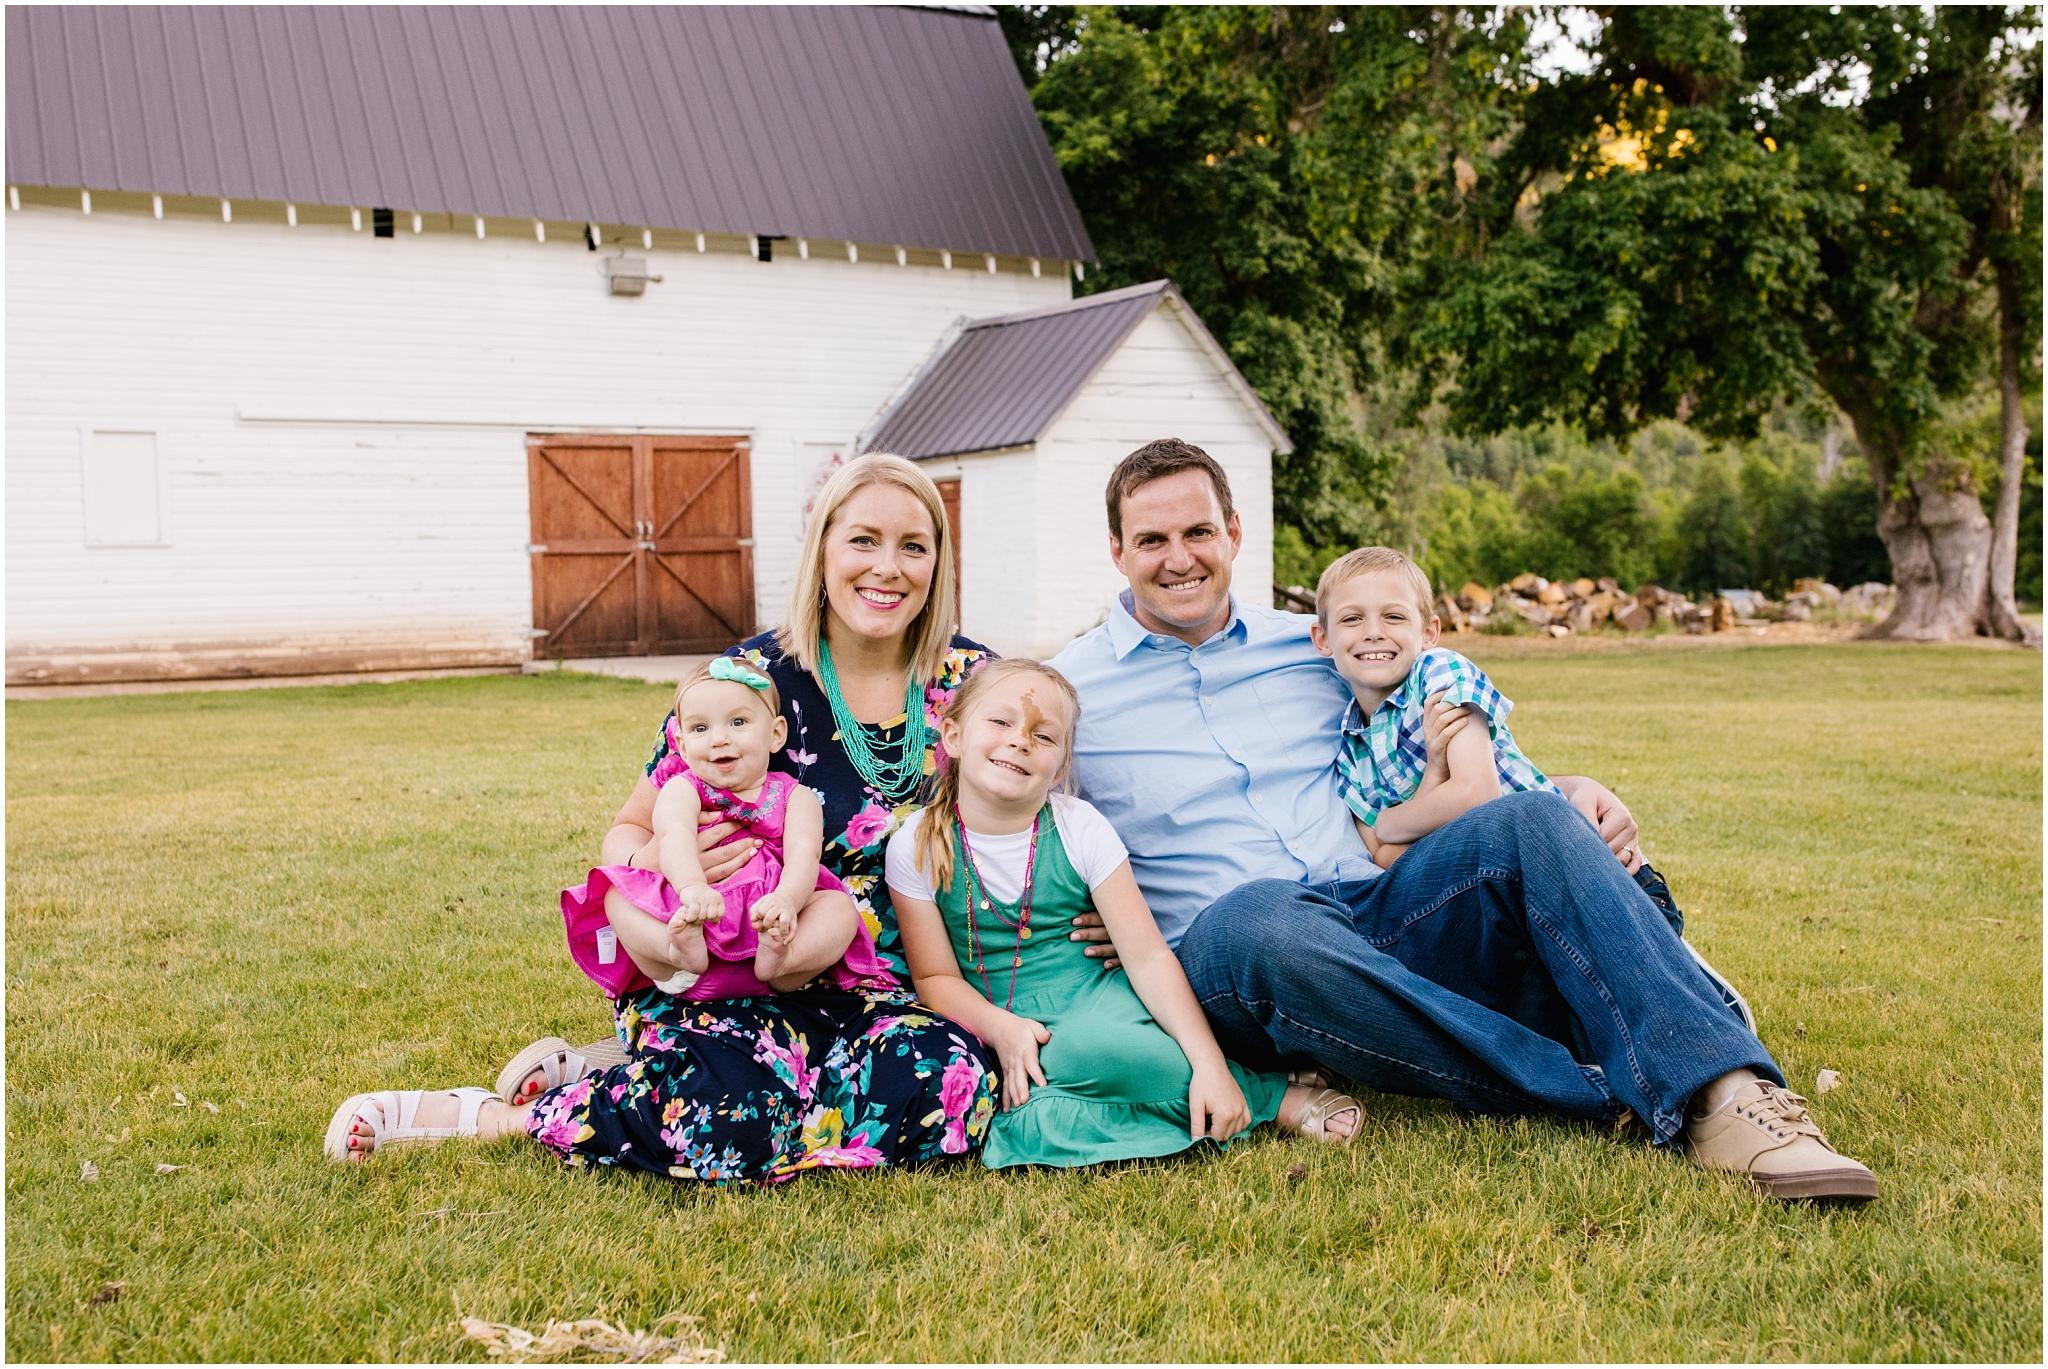 Lizzie-B-Imagery-Utah-Family-Photographer-Utah-County-Photographer-Hobble-Creek-Canyon_0029.jpg